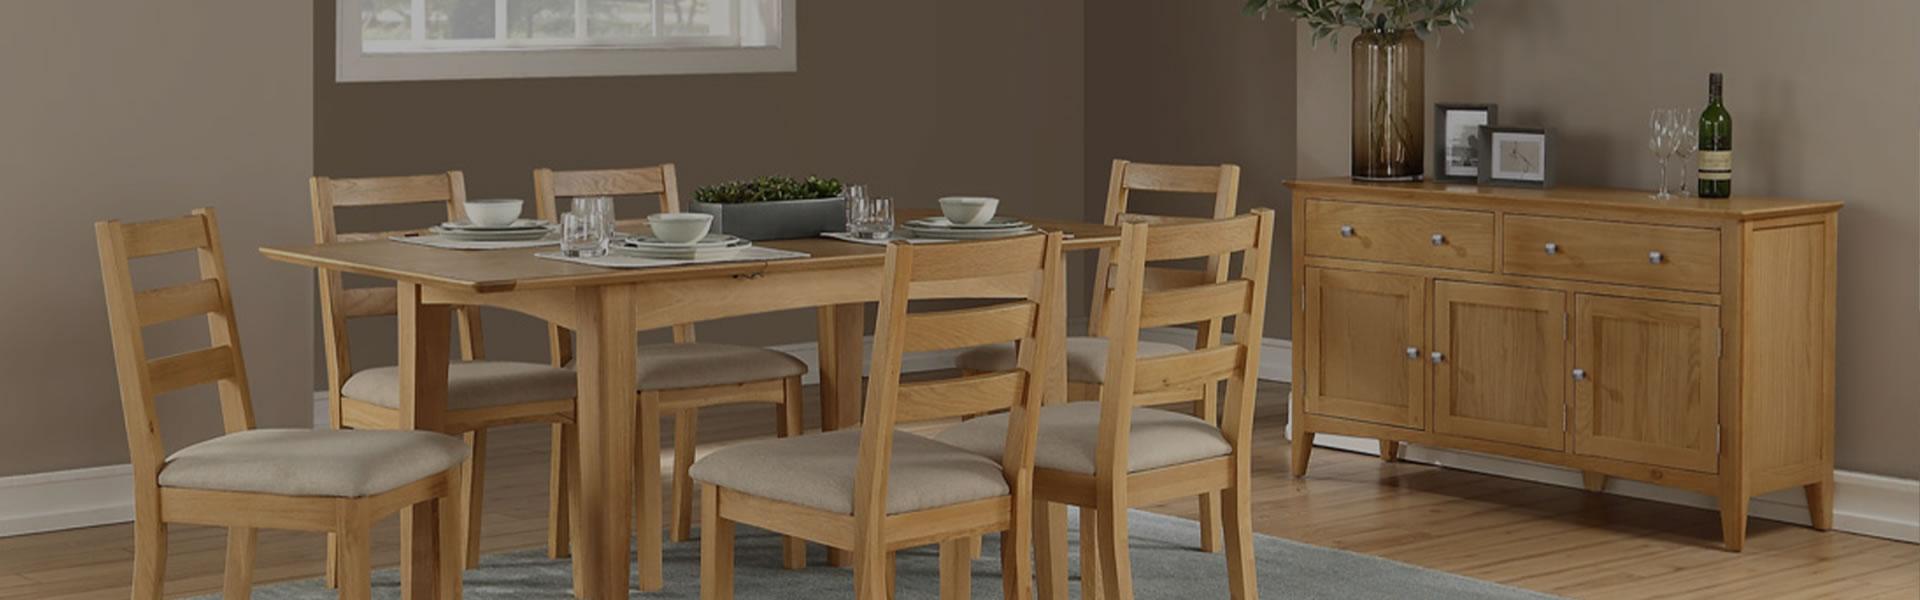 Steptoes Cyprus Home Furniture